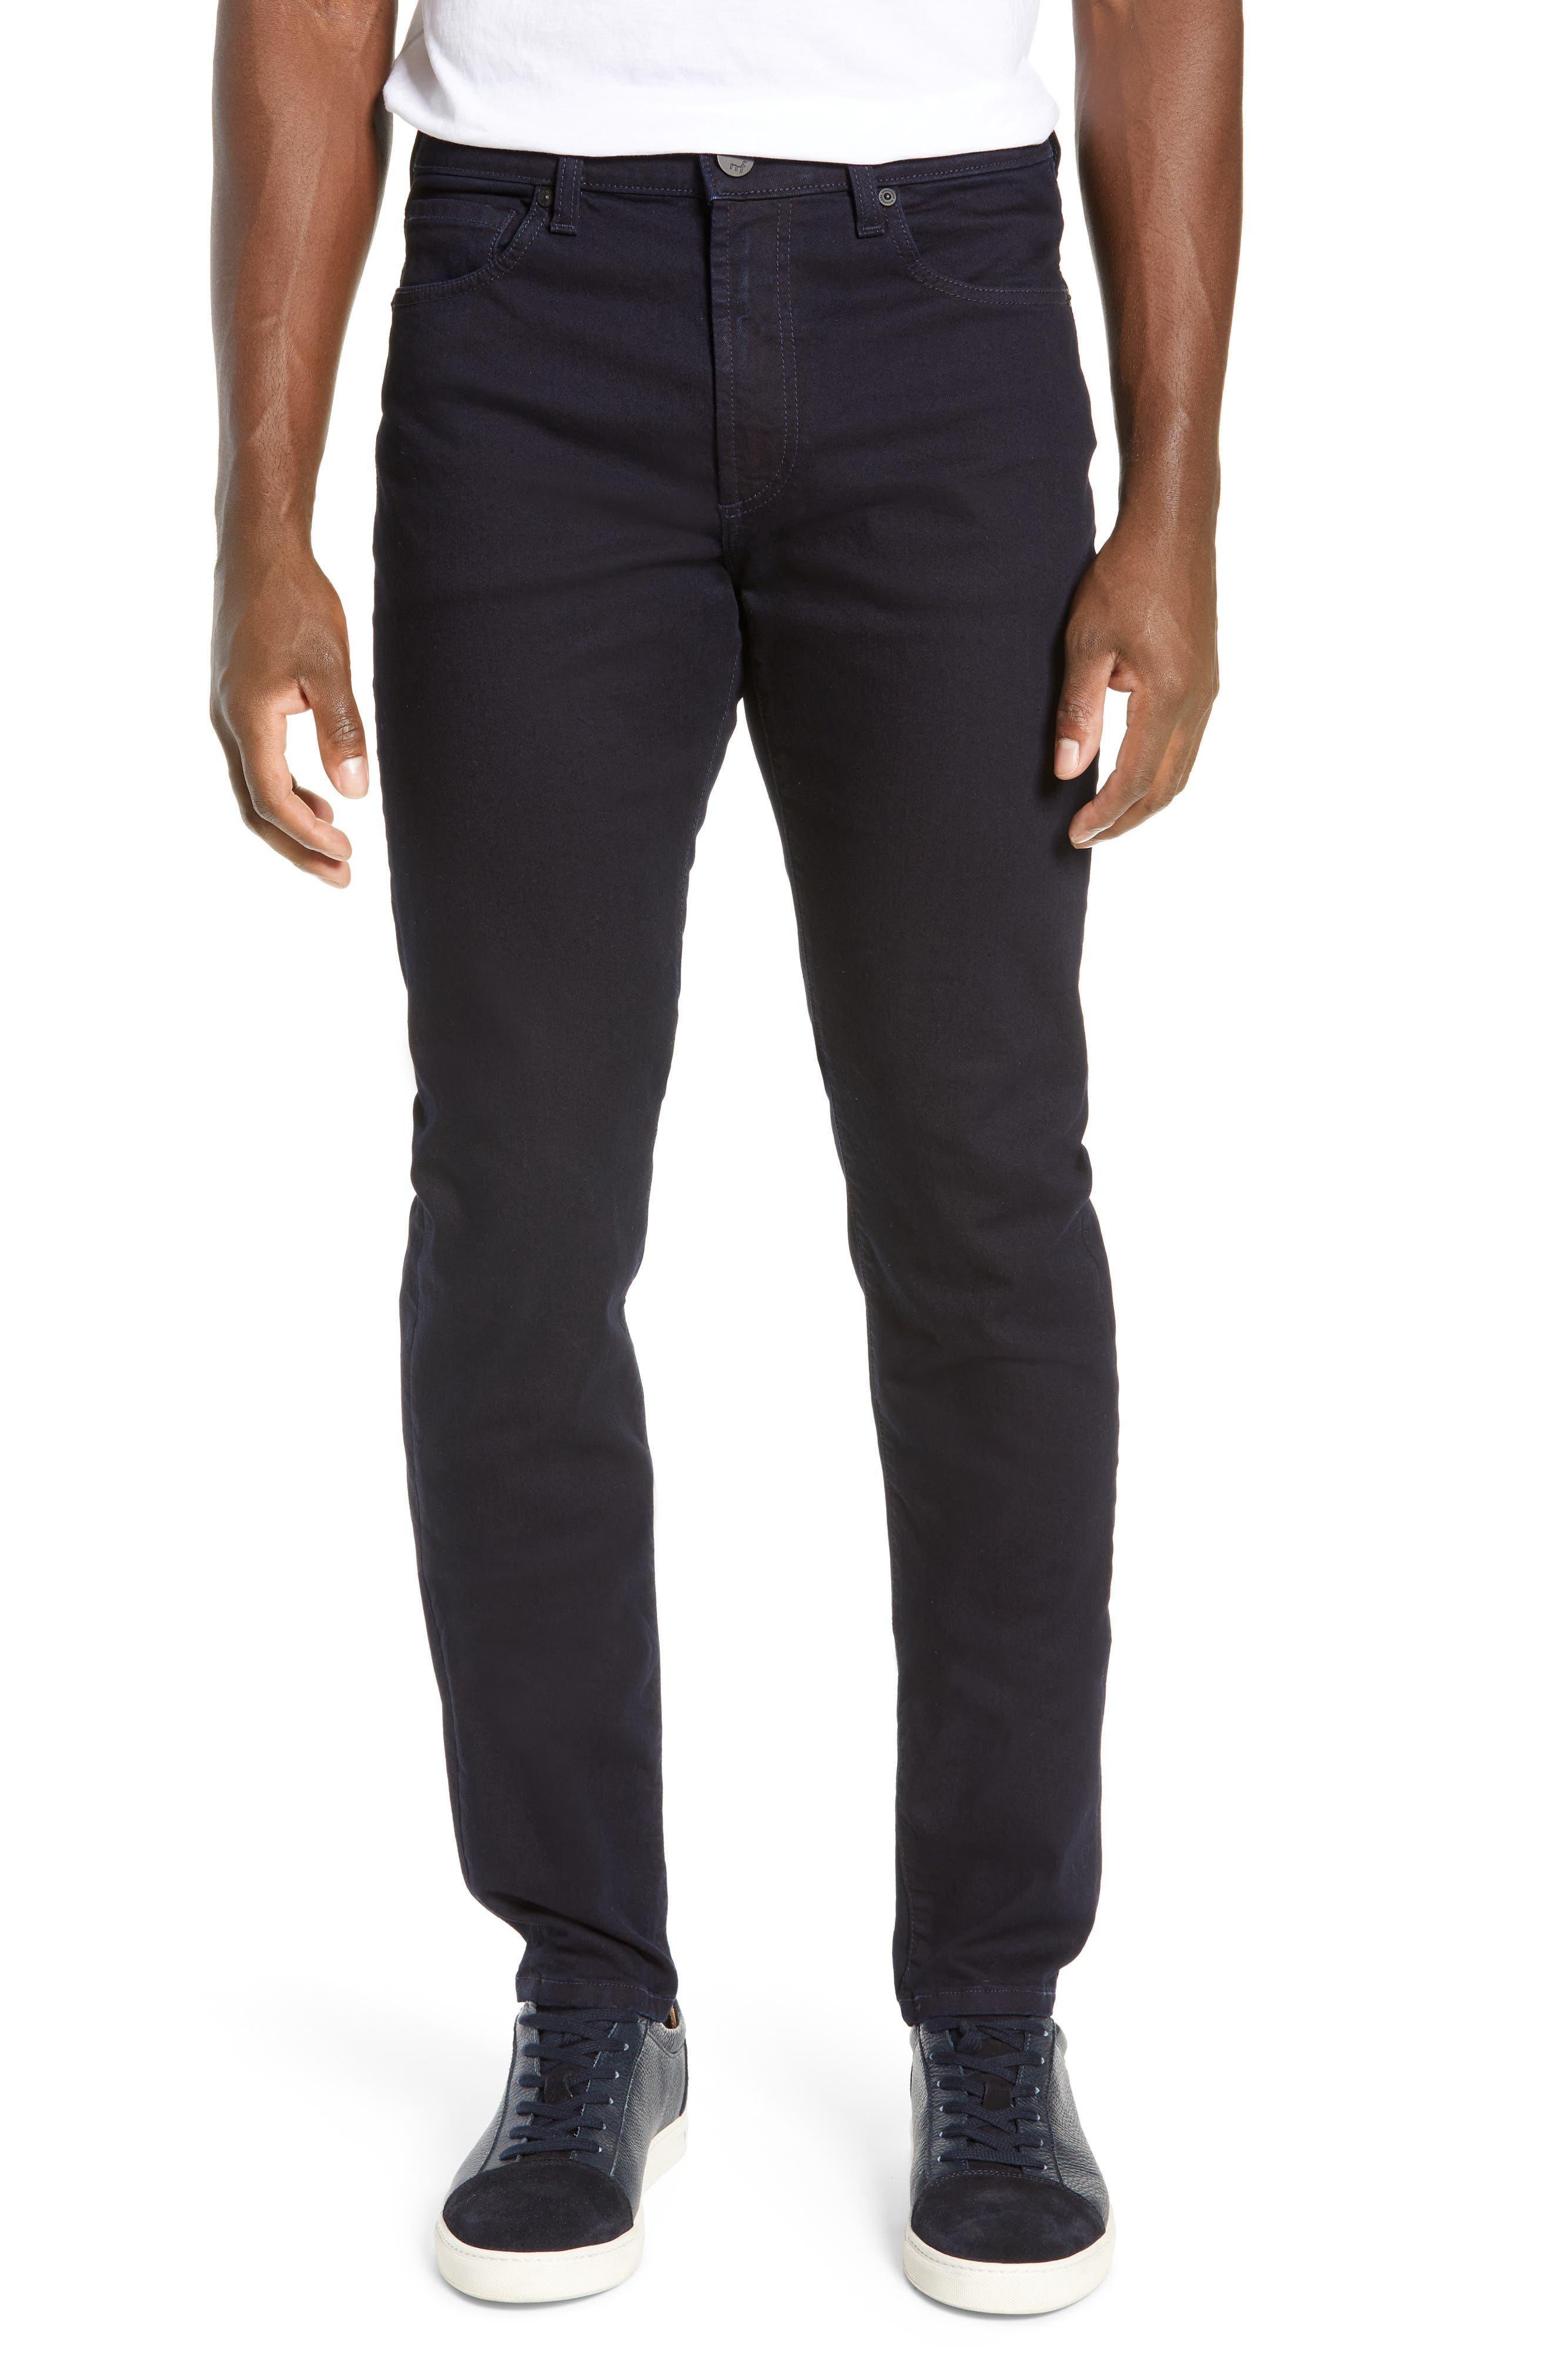 MONFRERE Deniro Slim Straight Leg Jeans in Ink